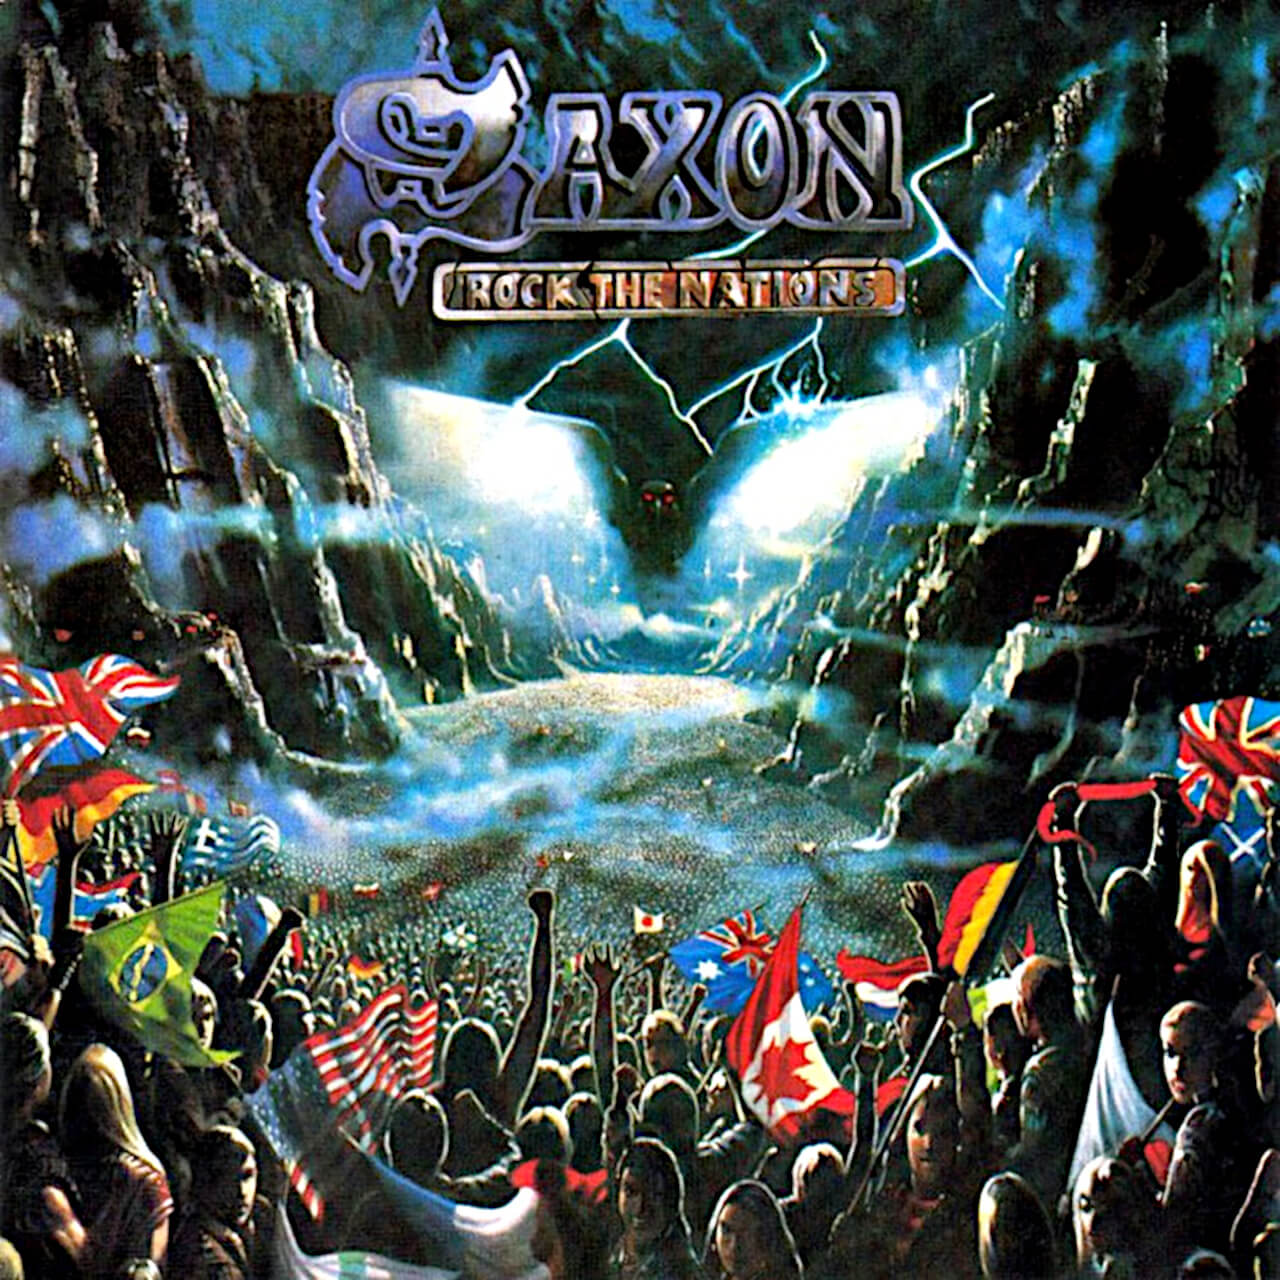 Саксонская Скала Наций